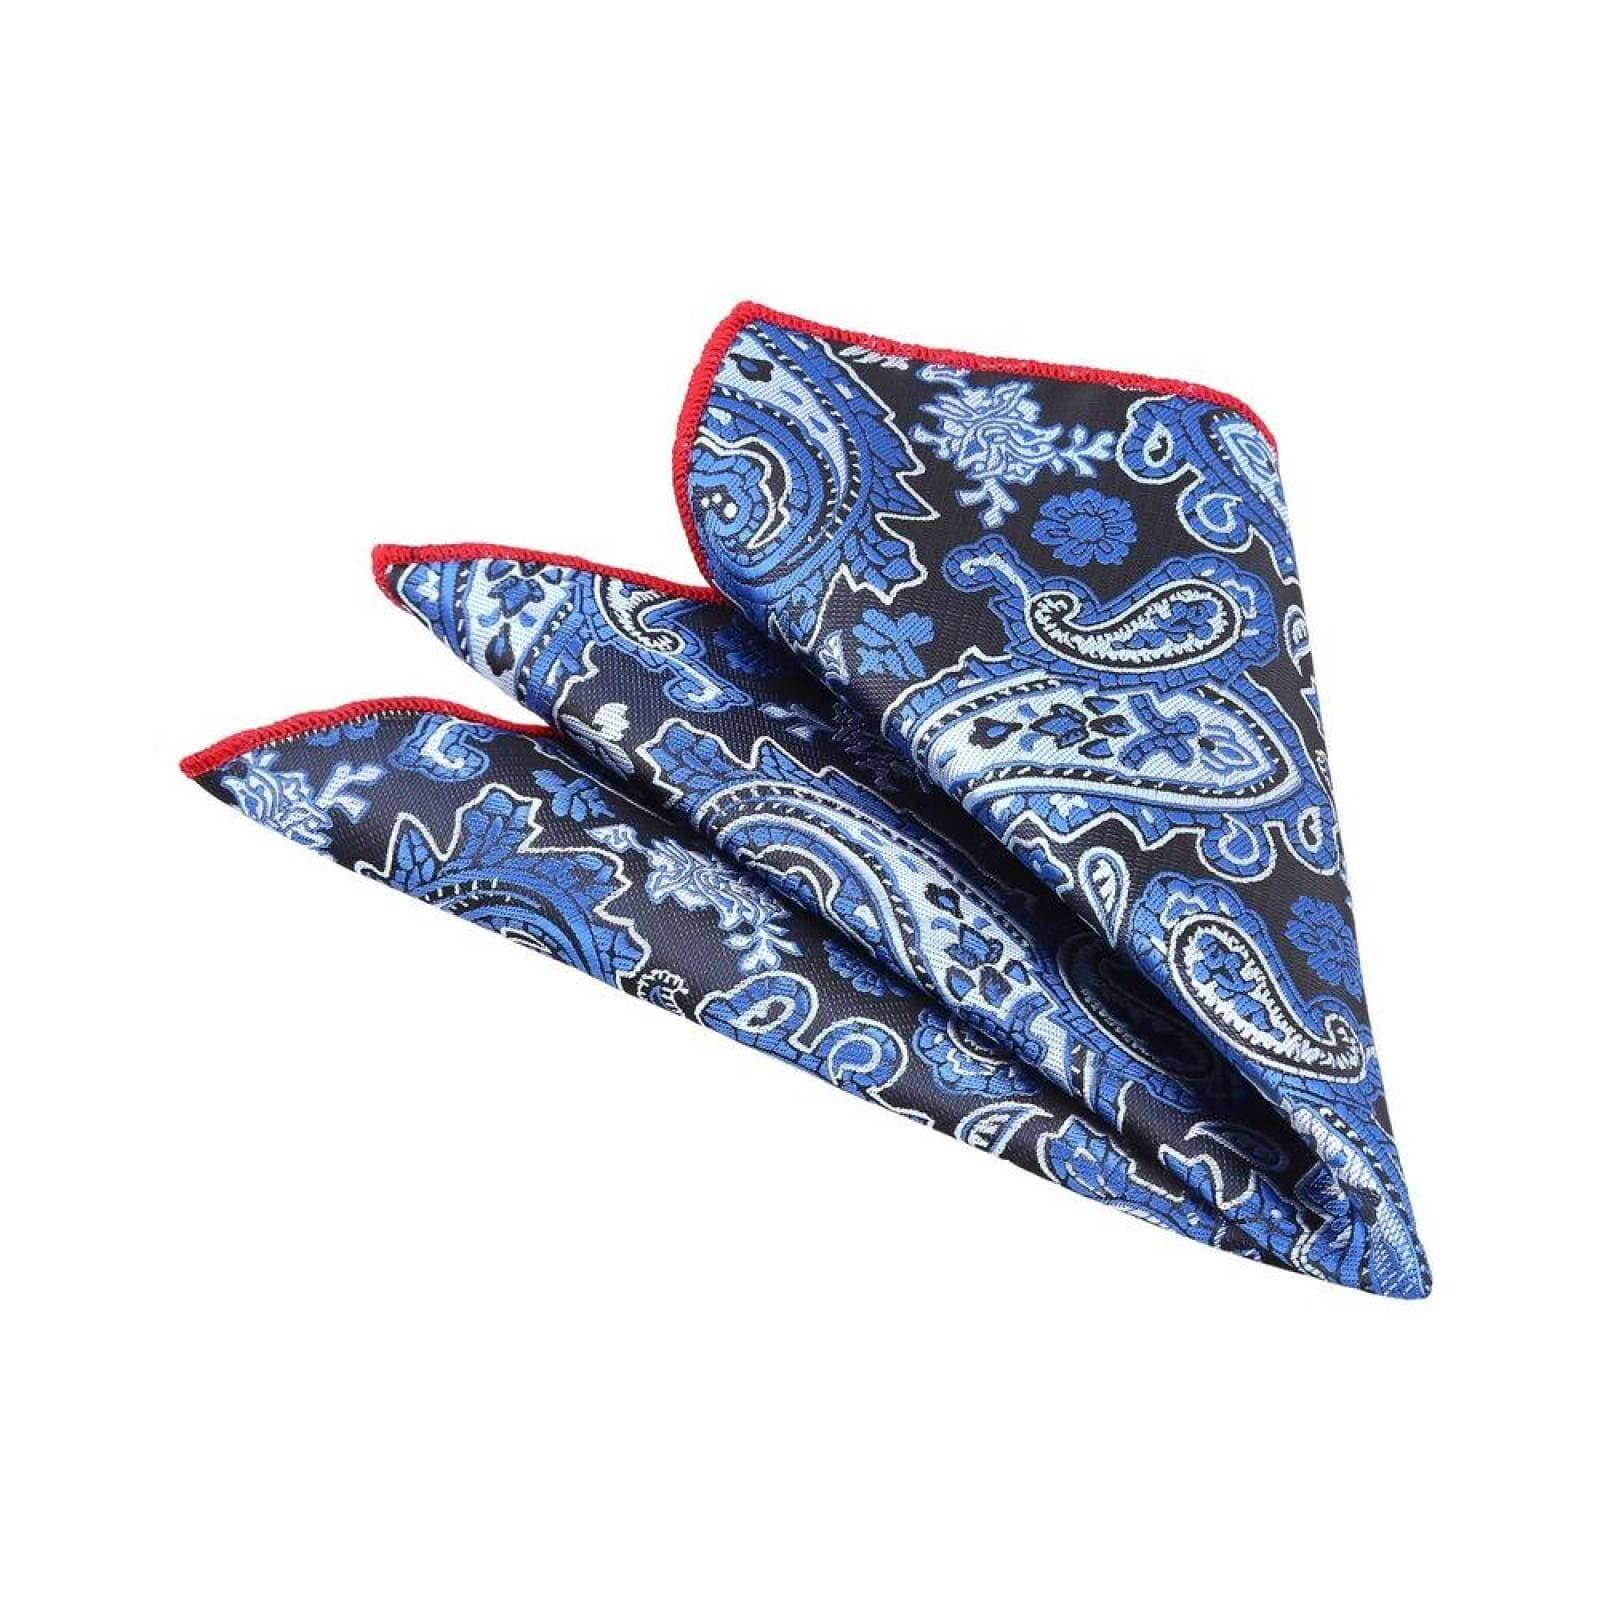 Pañuelo Royal Flush azul marino con cachemira azul rey ribete rojo poliéster